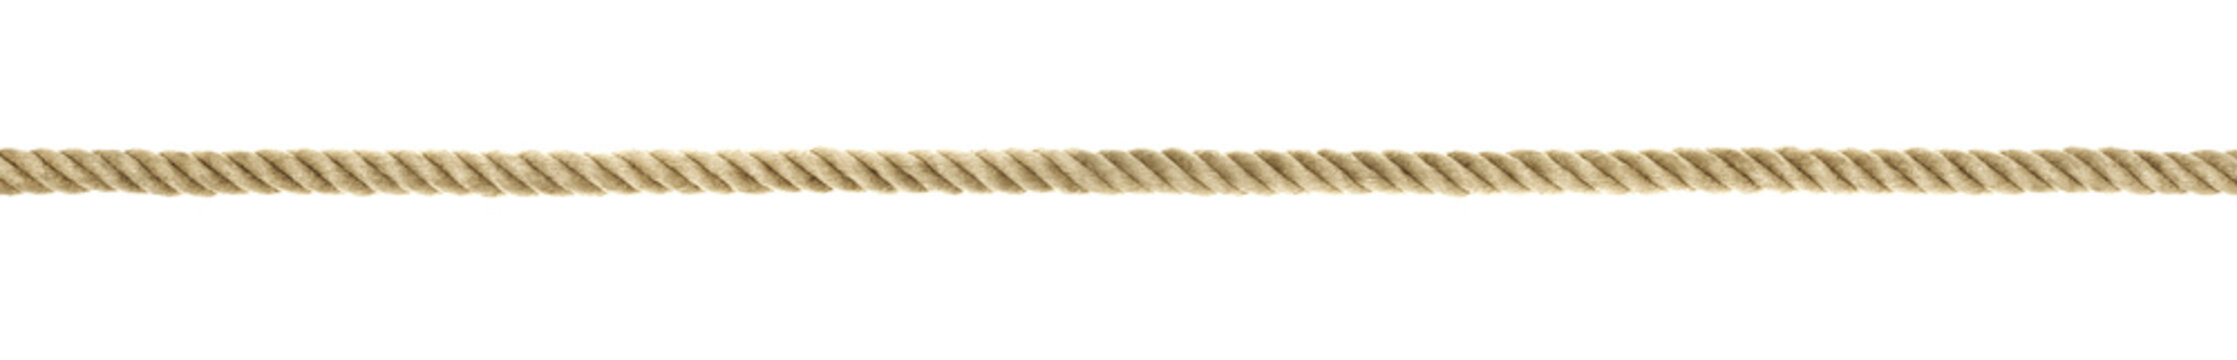 Seil Detail Querformat ohne Knoten